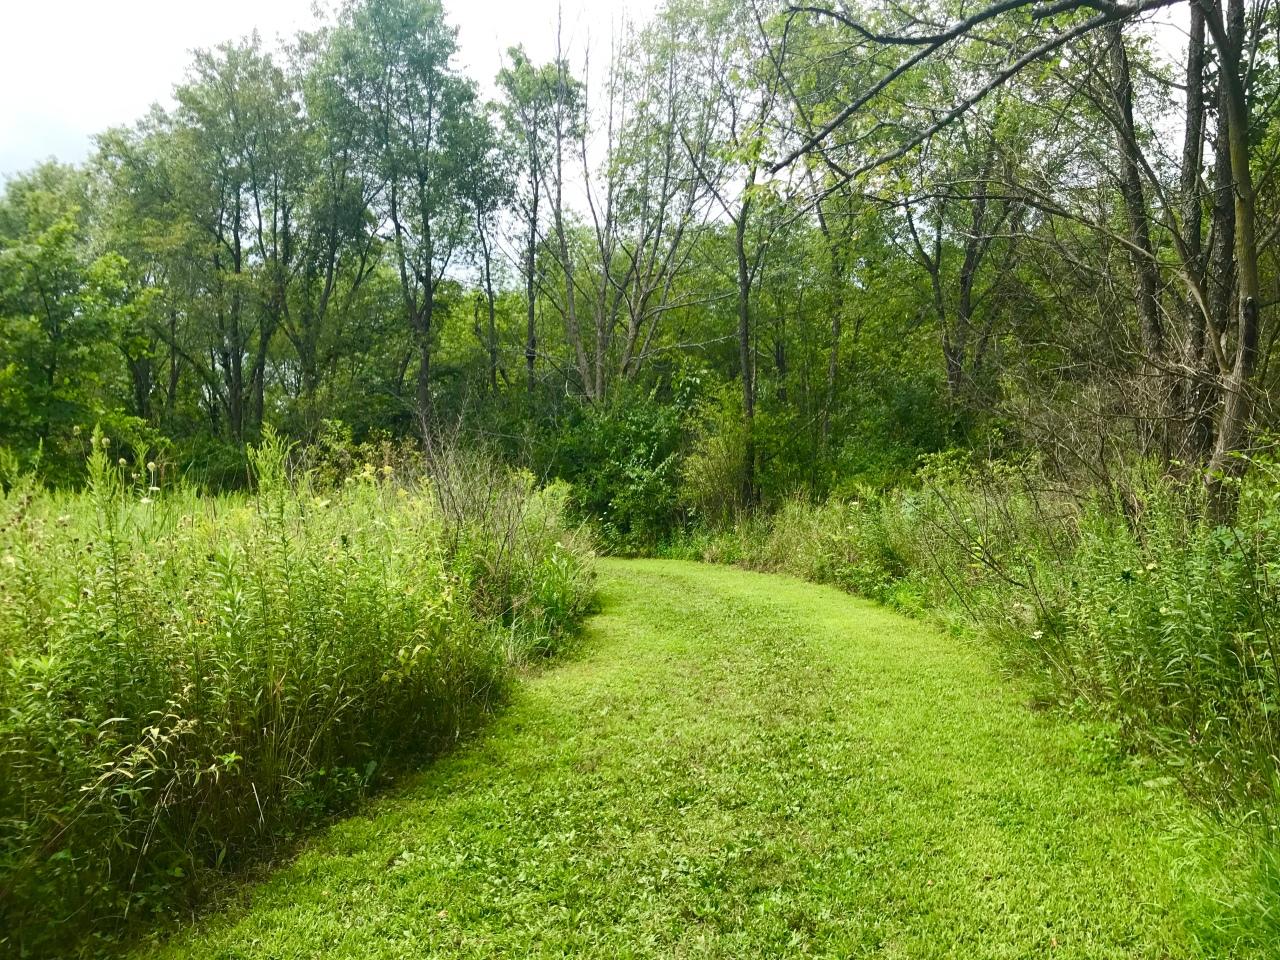 Kishwaukee Gorge North Forest Preserve –Illinois